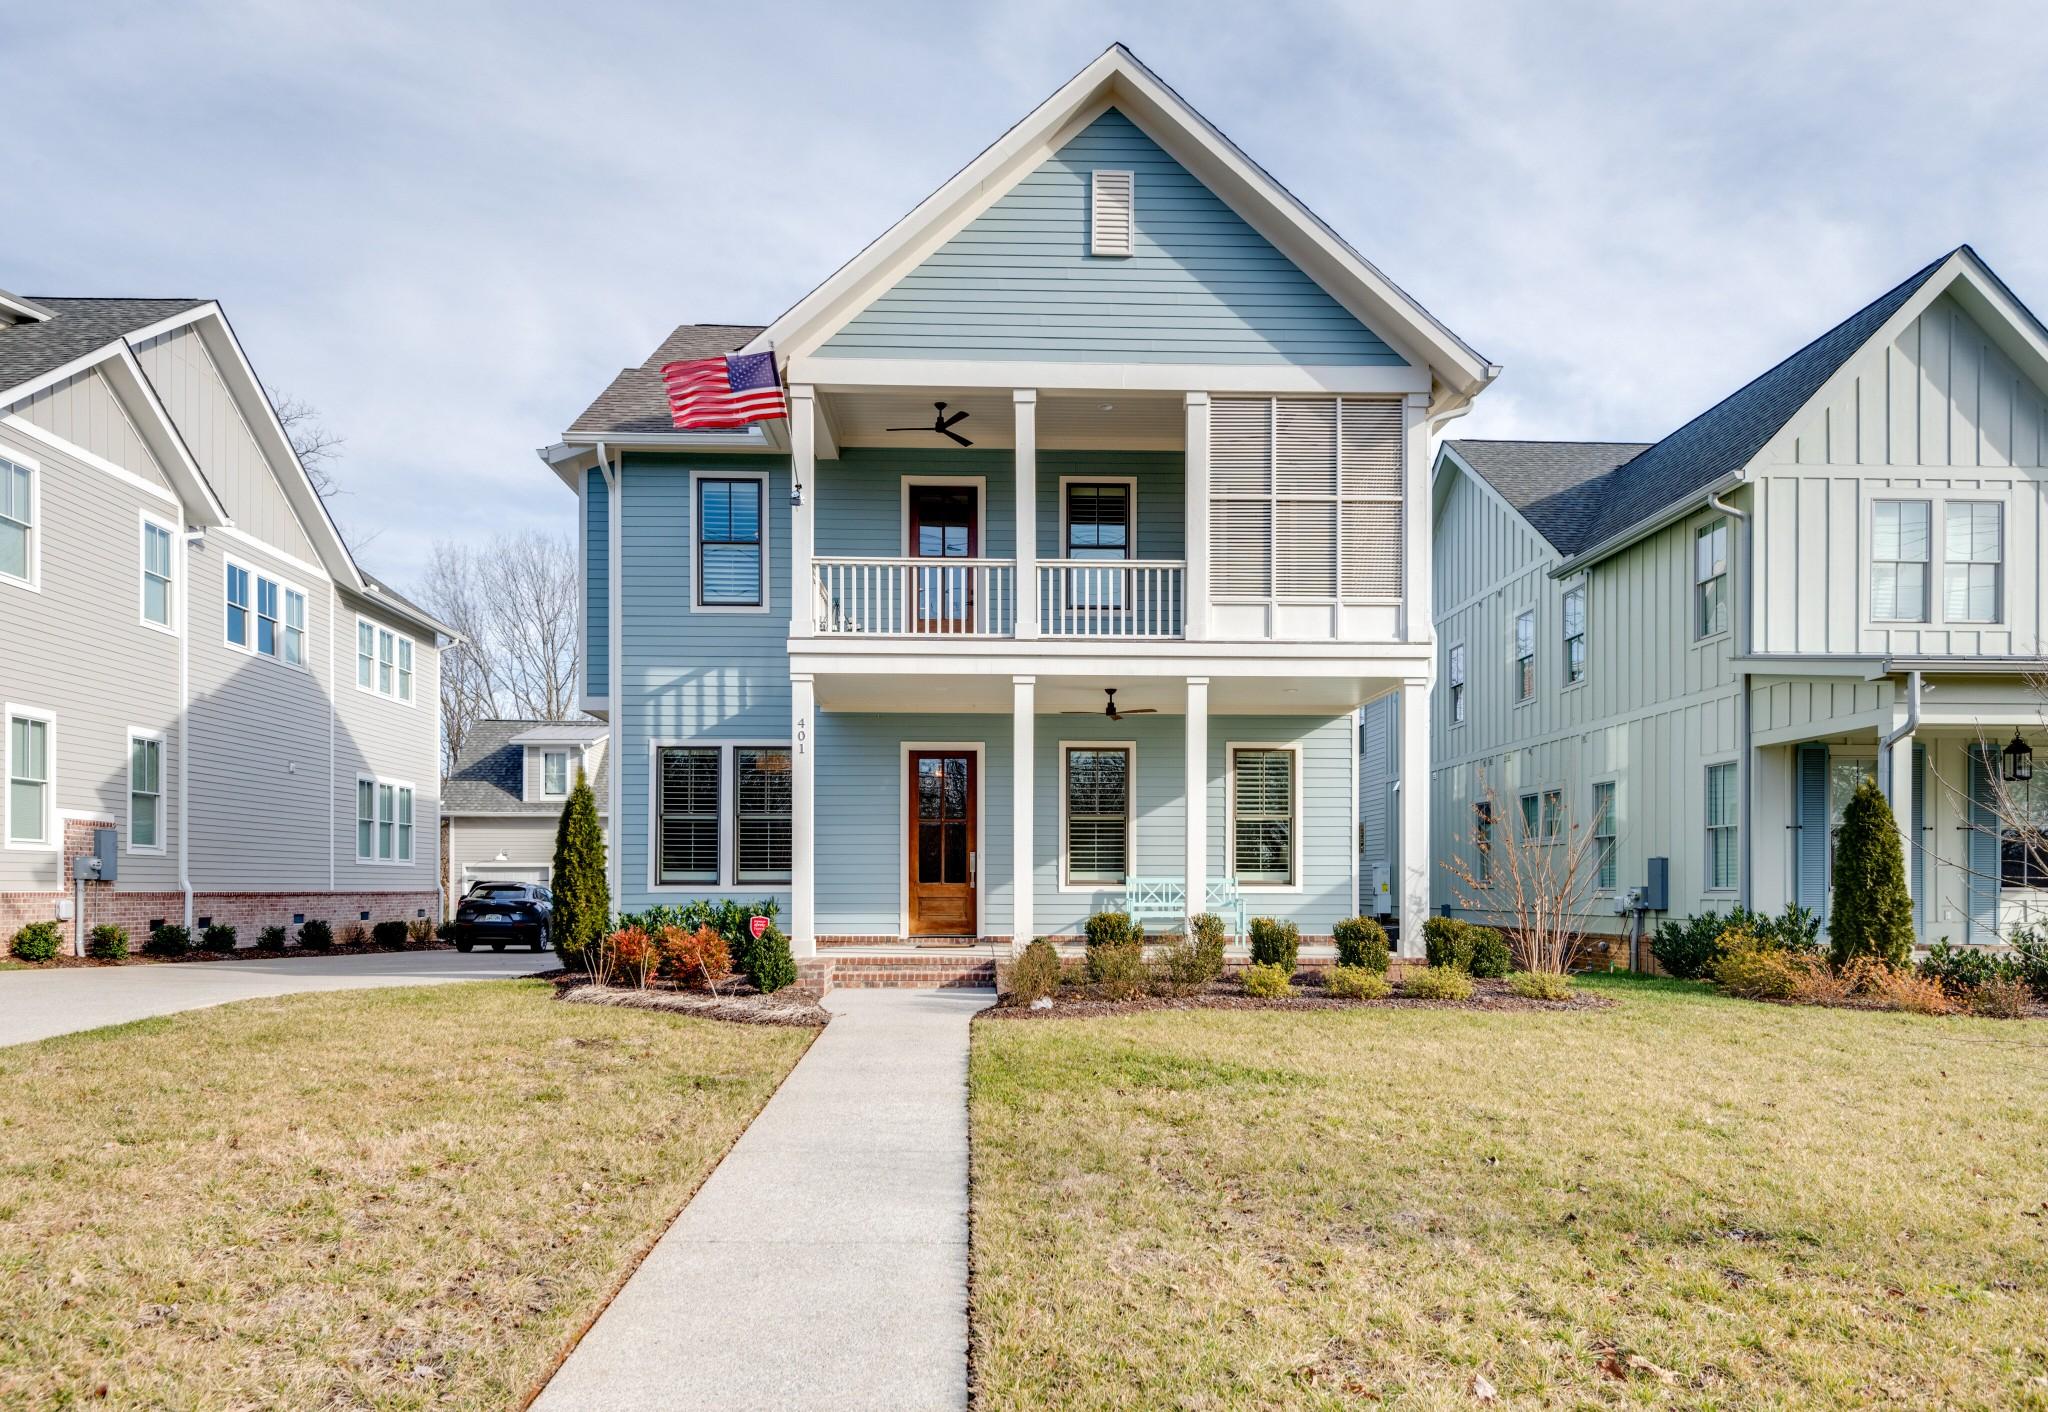 401 Eddy Ln Property Photo - Franklin, TN real estate listing